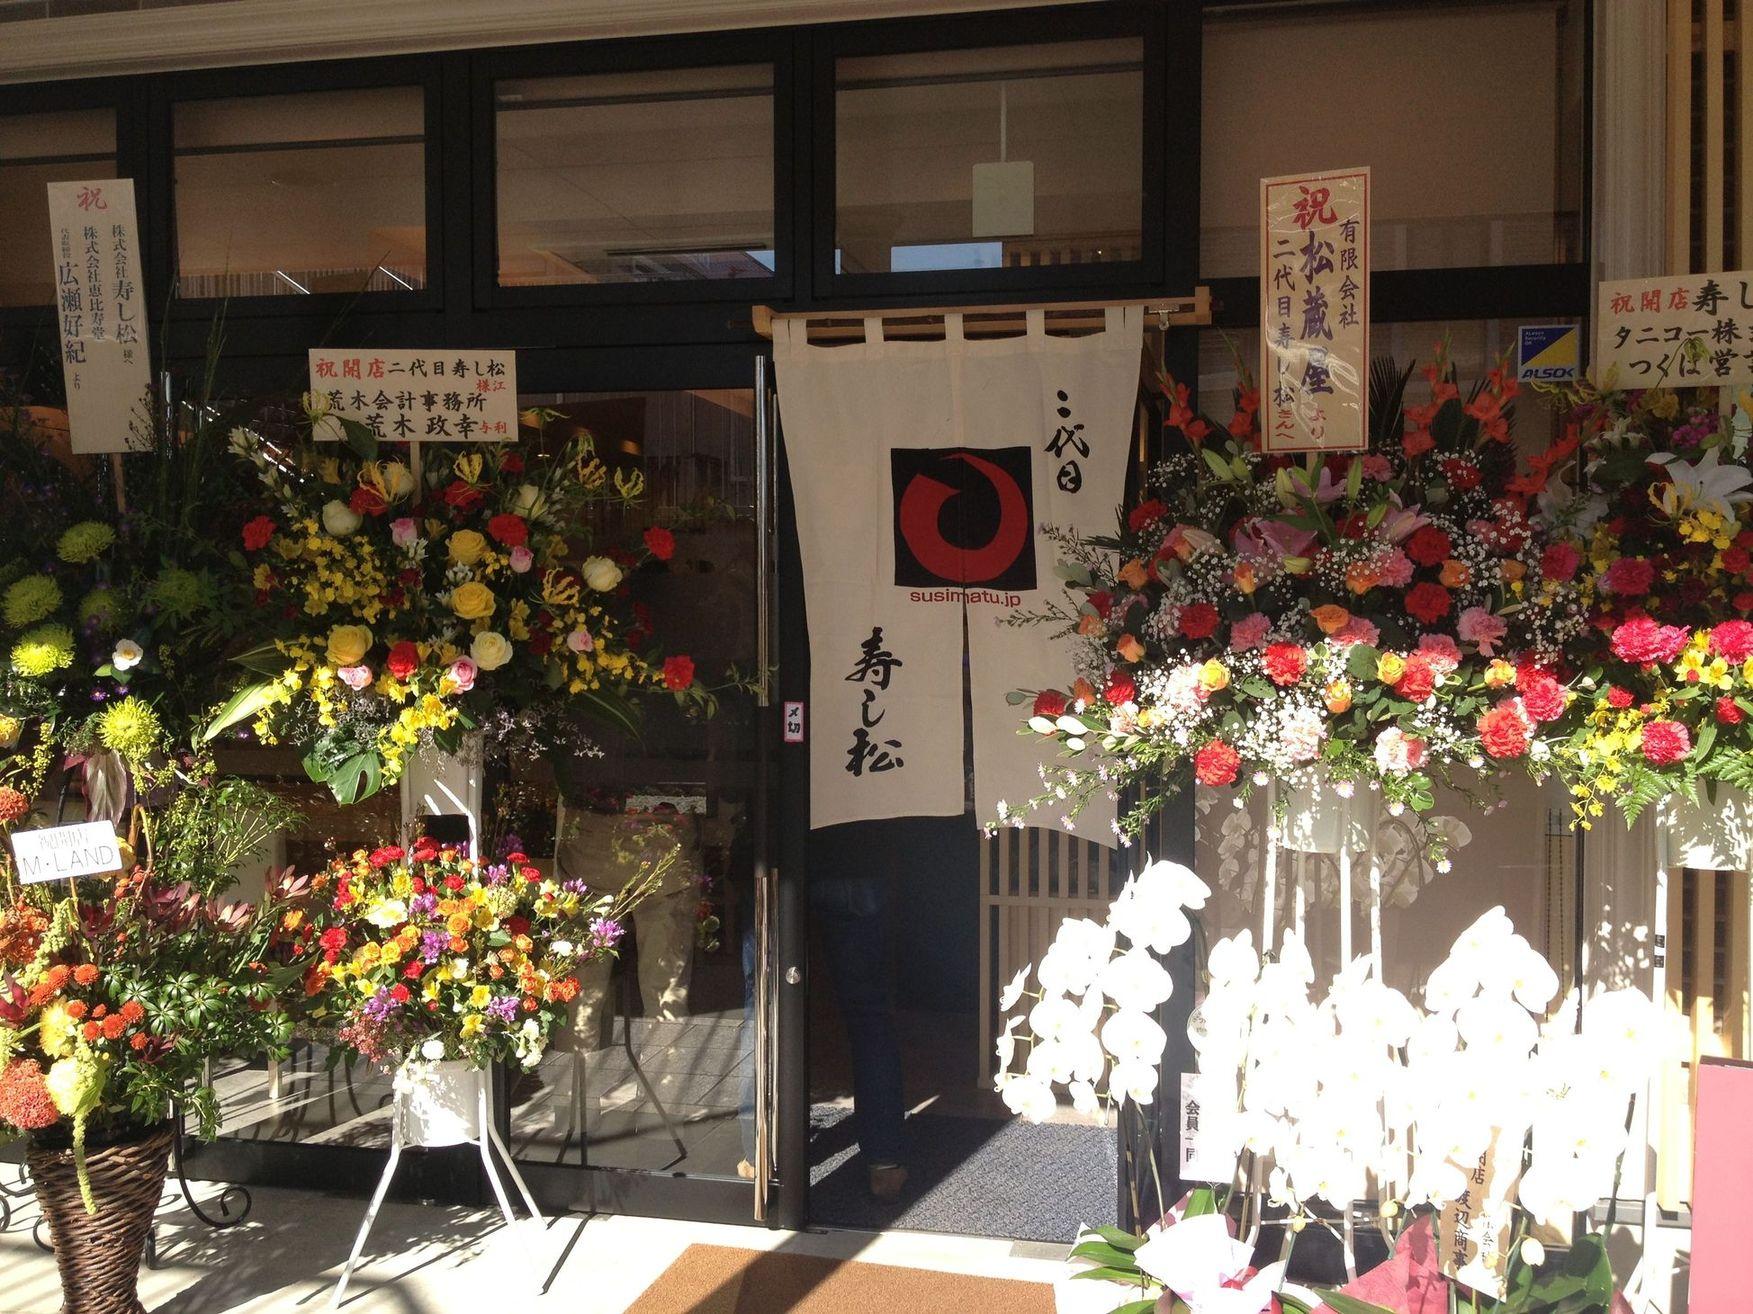 寿し松 研究学園店